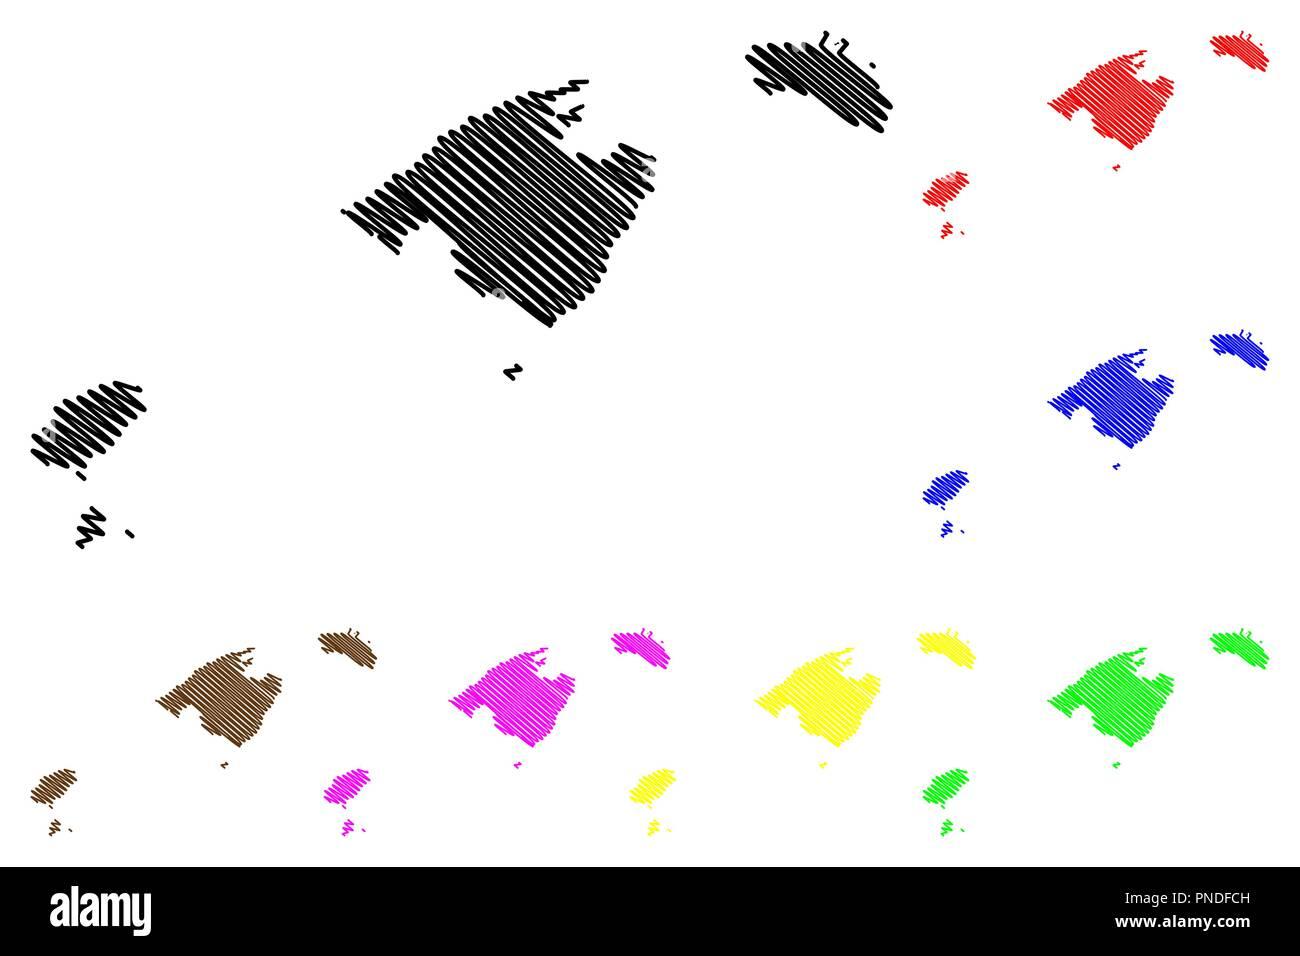 Ibiza Karte Umriss.Balearen Spanien Autonome Gemeinschaft Karte Vektor Illustration